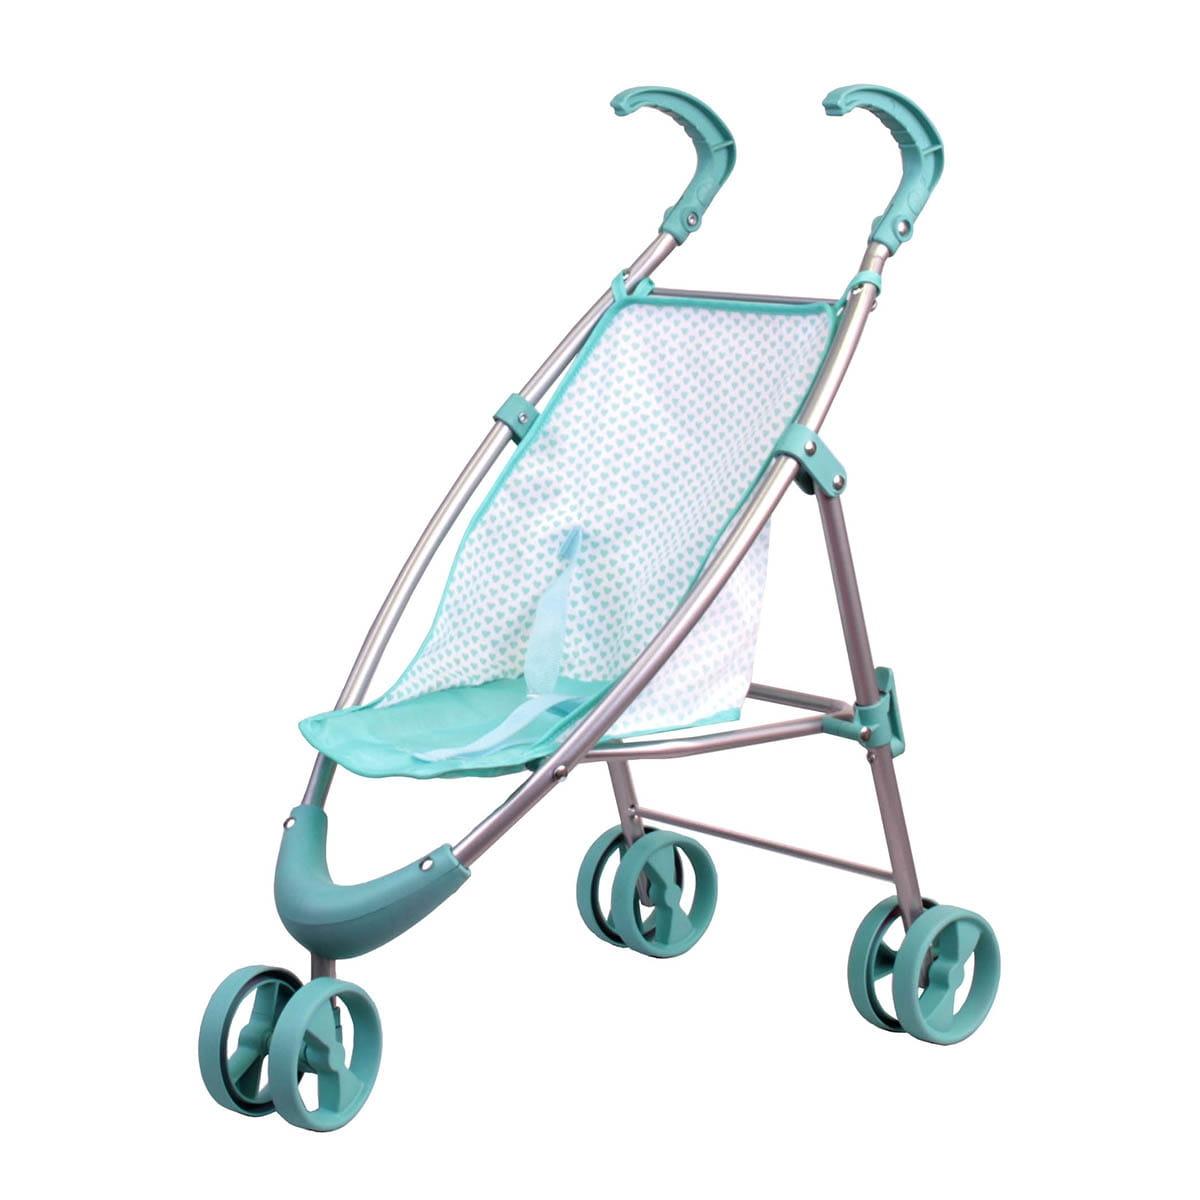 Прогулочная коляска для кукол Gulliver 22-12030-1 с вращающимися колесами - мятная